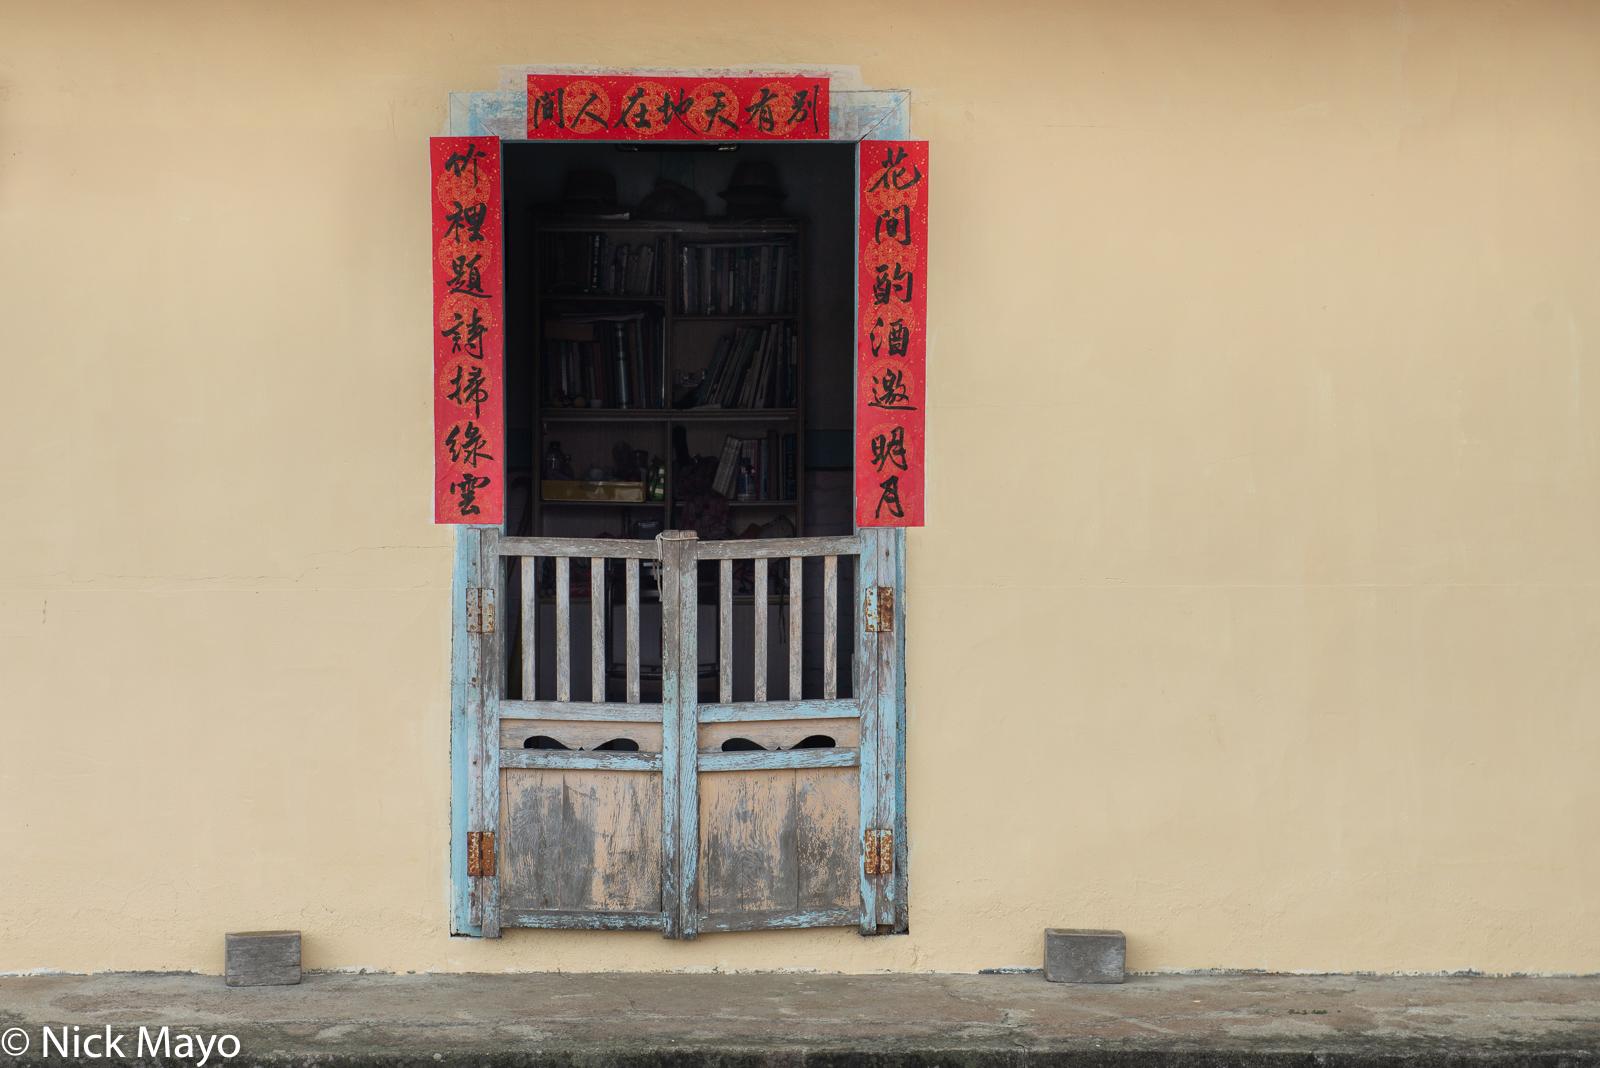 The doorway of a traditional san-ho yuan in Lugu, Nantou County.